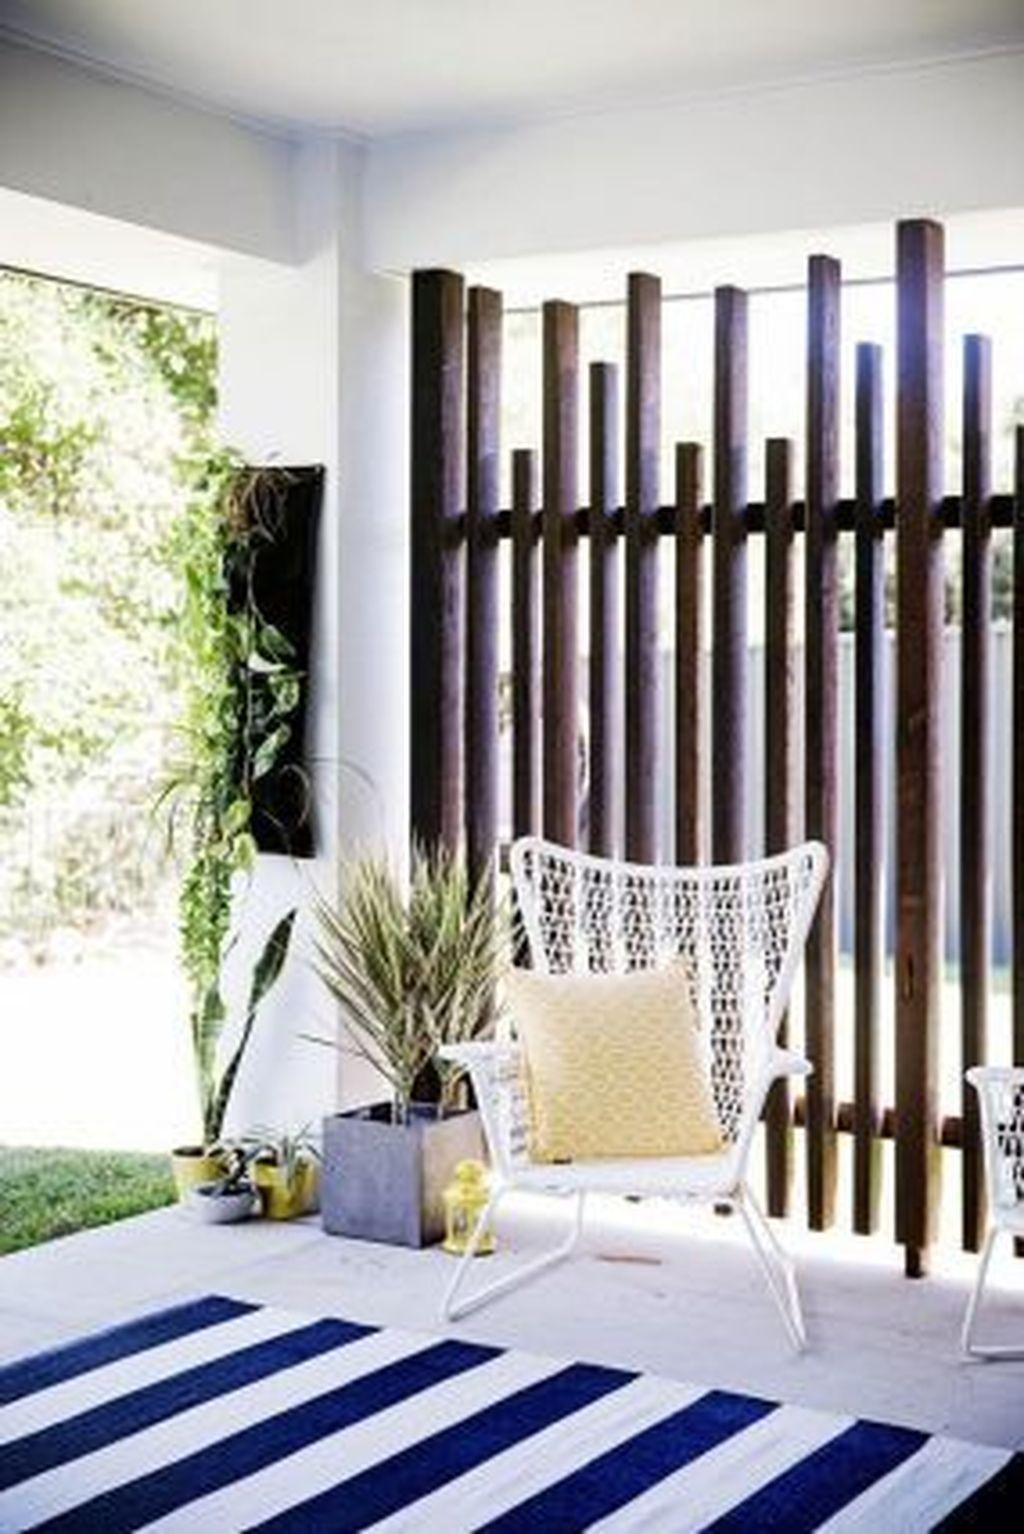 31 nice backyard wall privacy fence design ideas privacy on backyard garden fence decor ideas id=59058